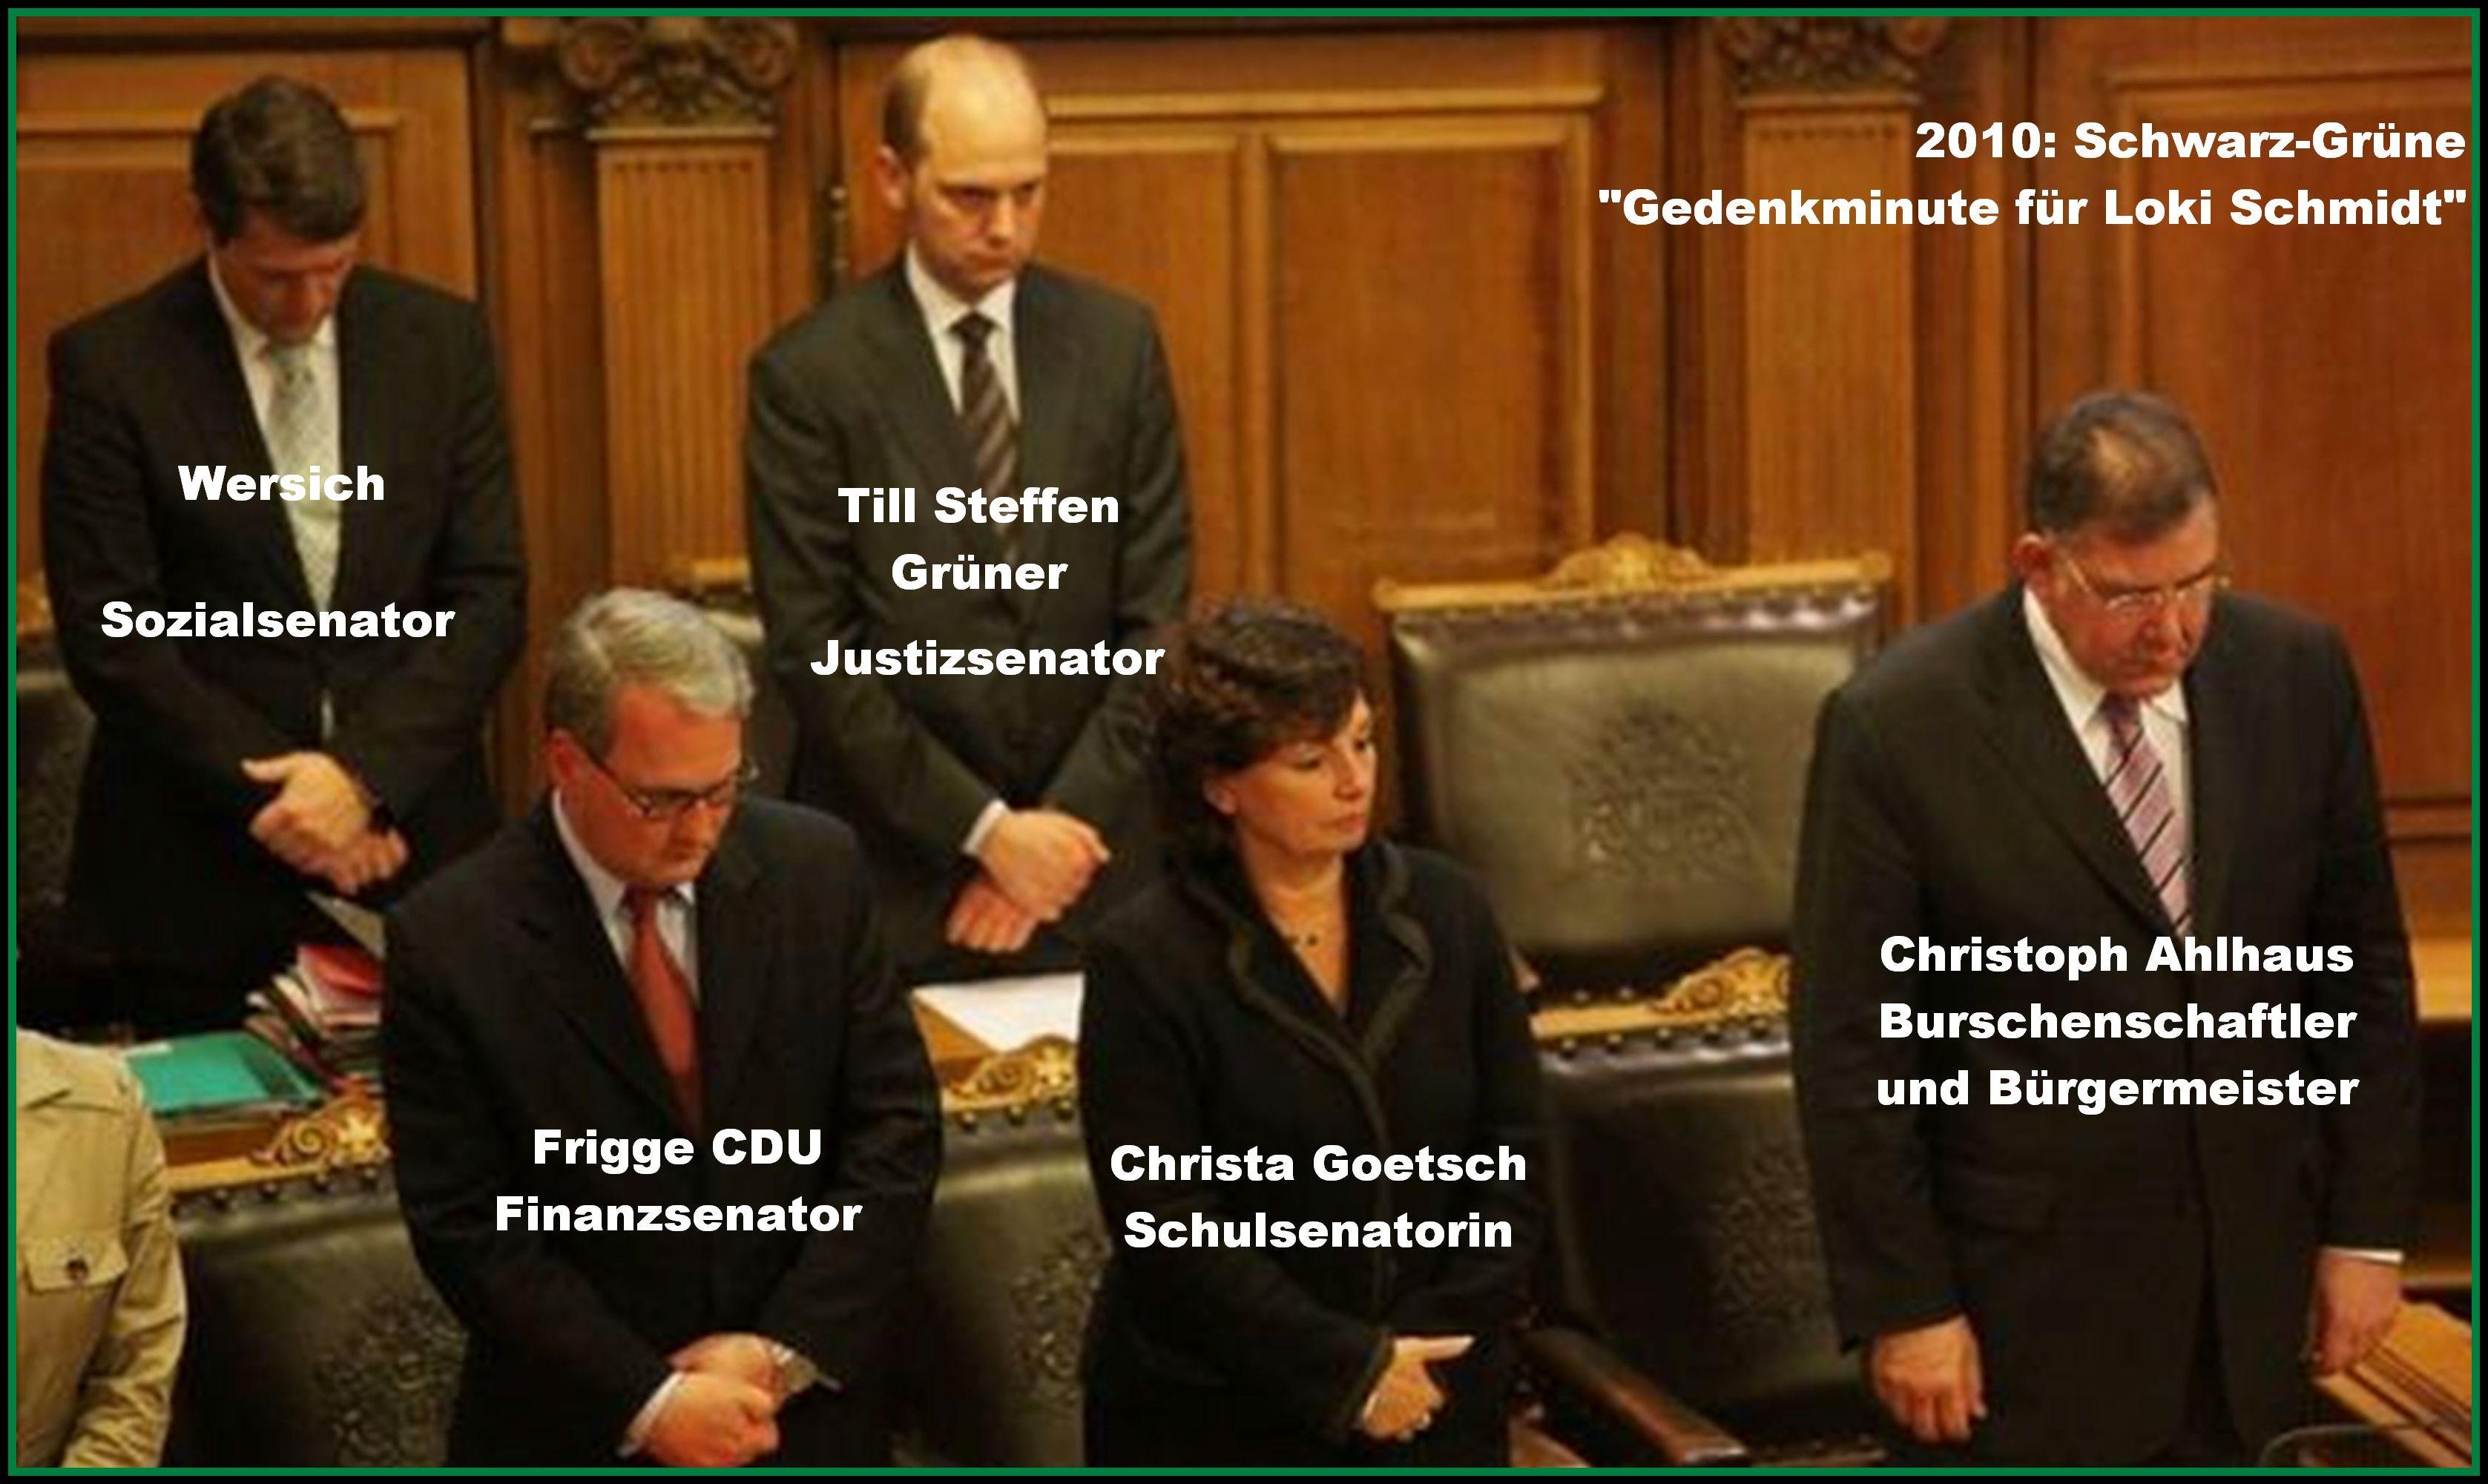 All-Parteien-Koalition in Hamburg